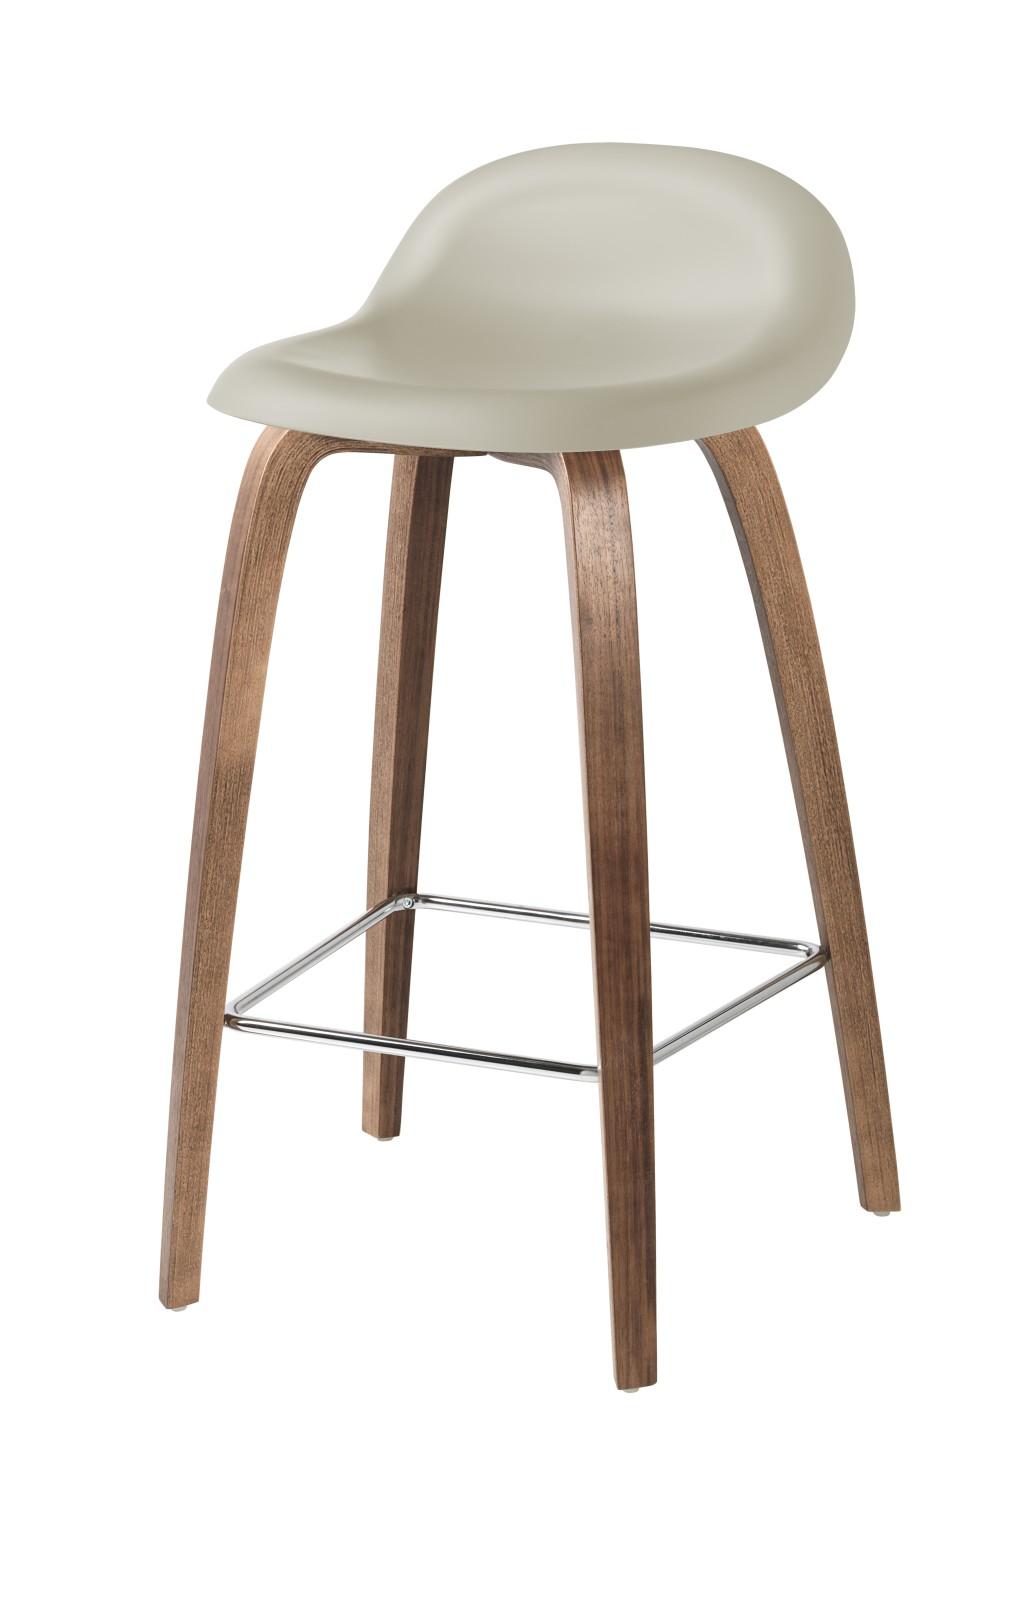 Gubi 3D Wood Base Counter Stool - Unupholstered Gubi HiRek Moon Grey, Gubi Wood American Walnut